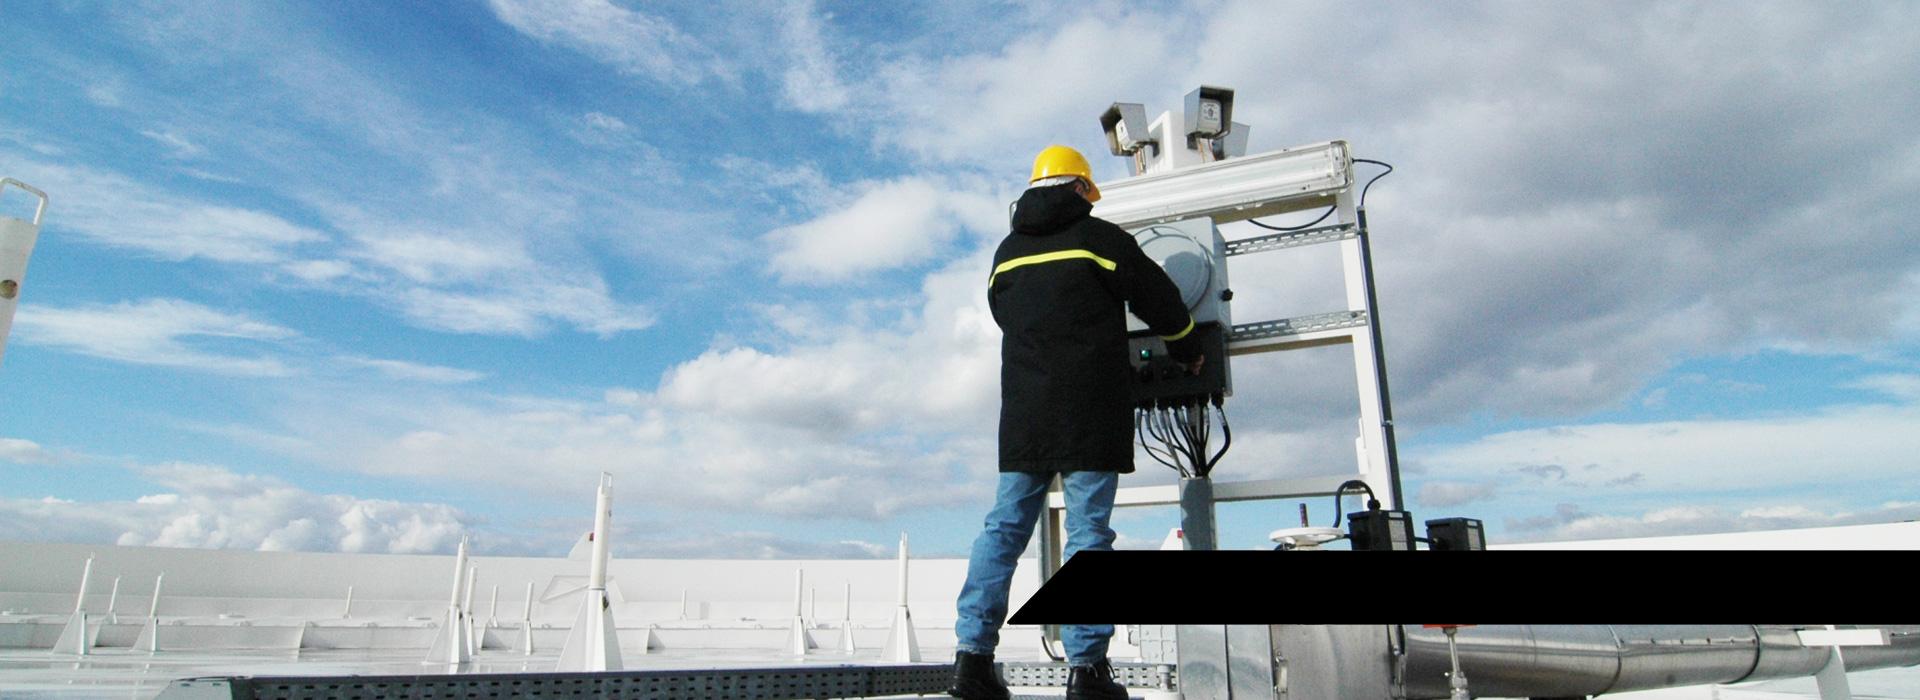 Roof Safety Solutions - Slide 1